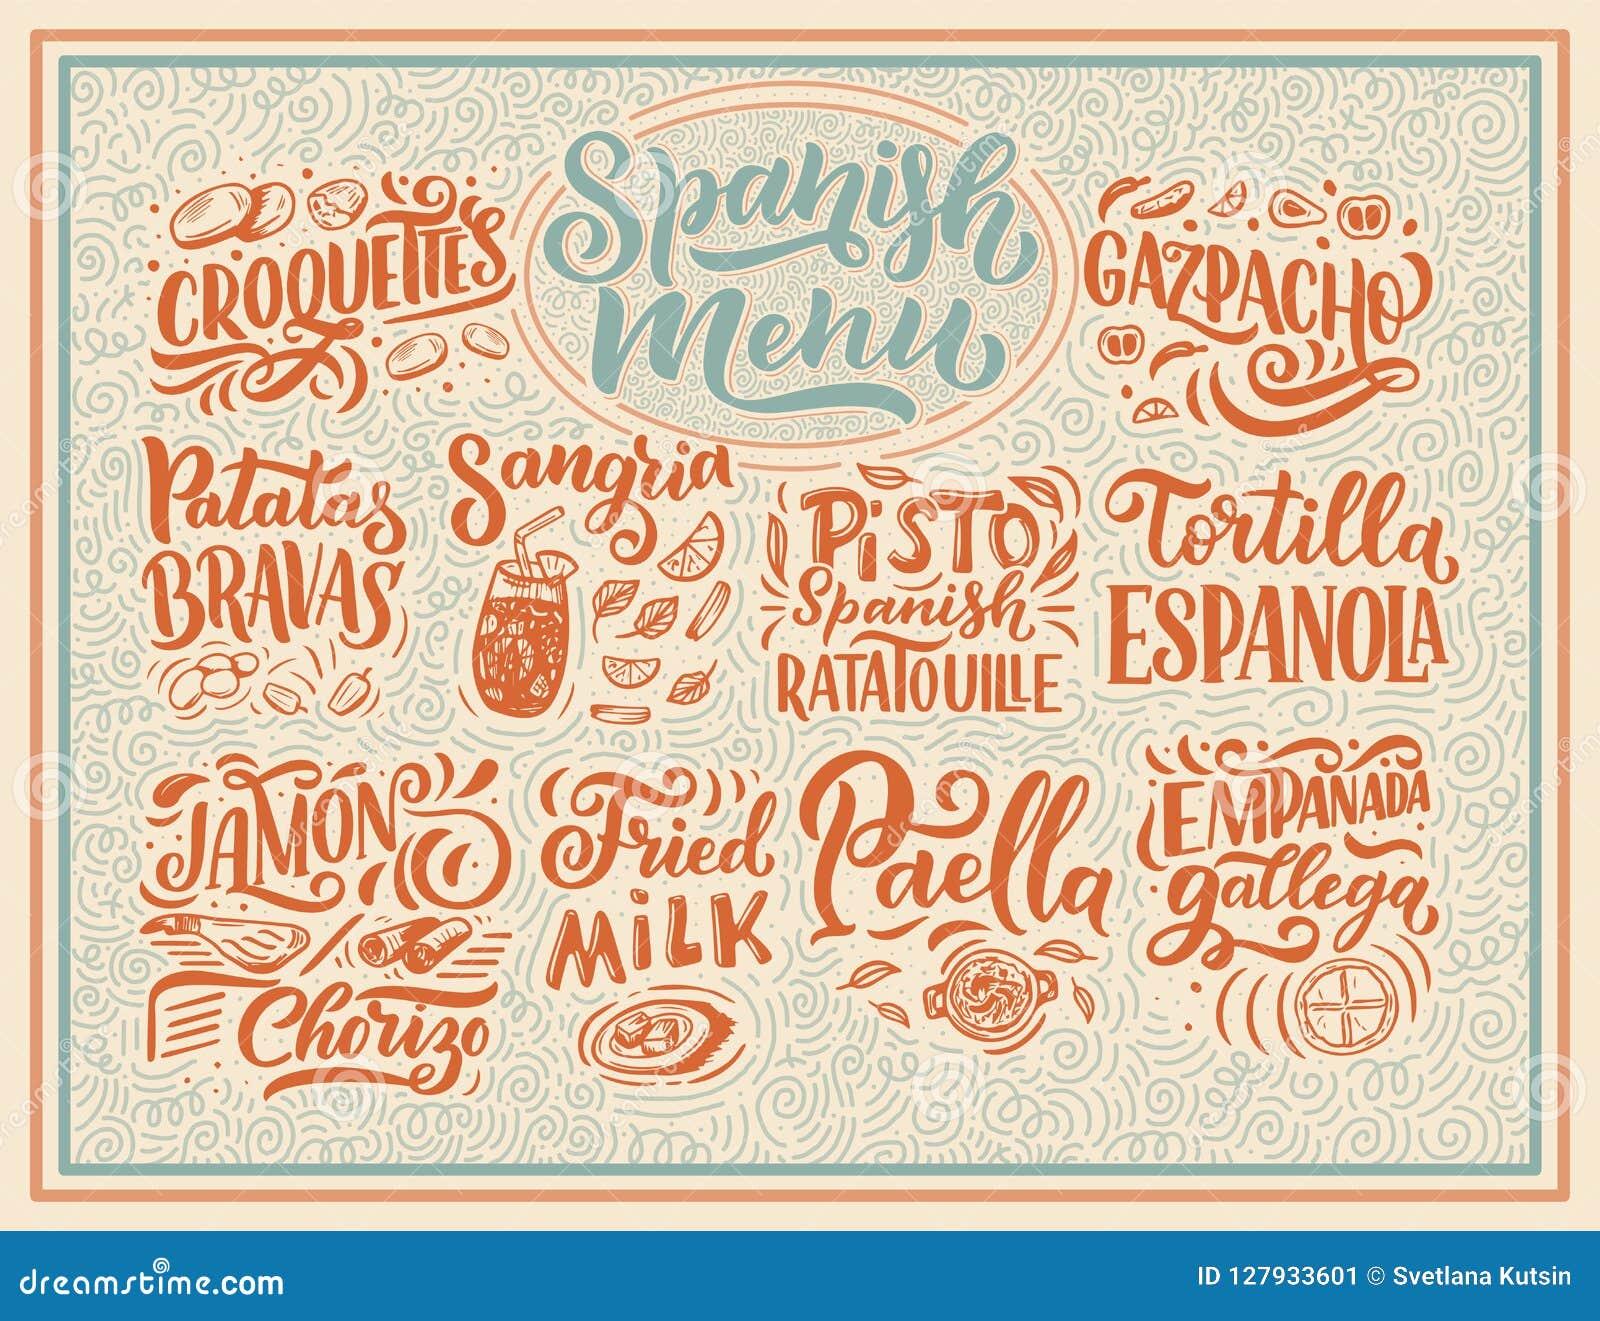 Dessin Avec La Main dessin à main levée de style de croquis de menu espagnol